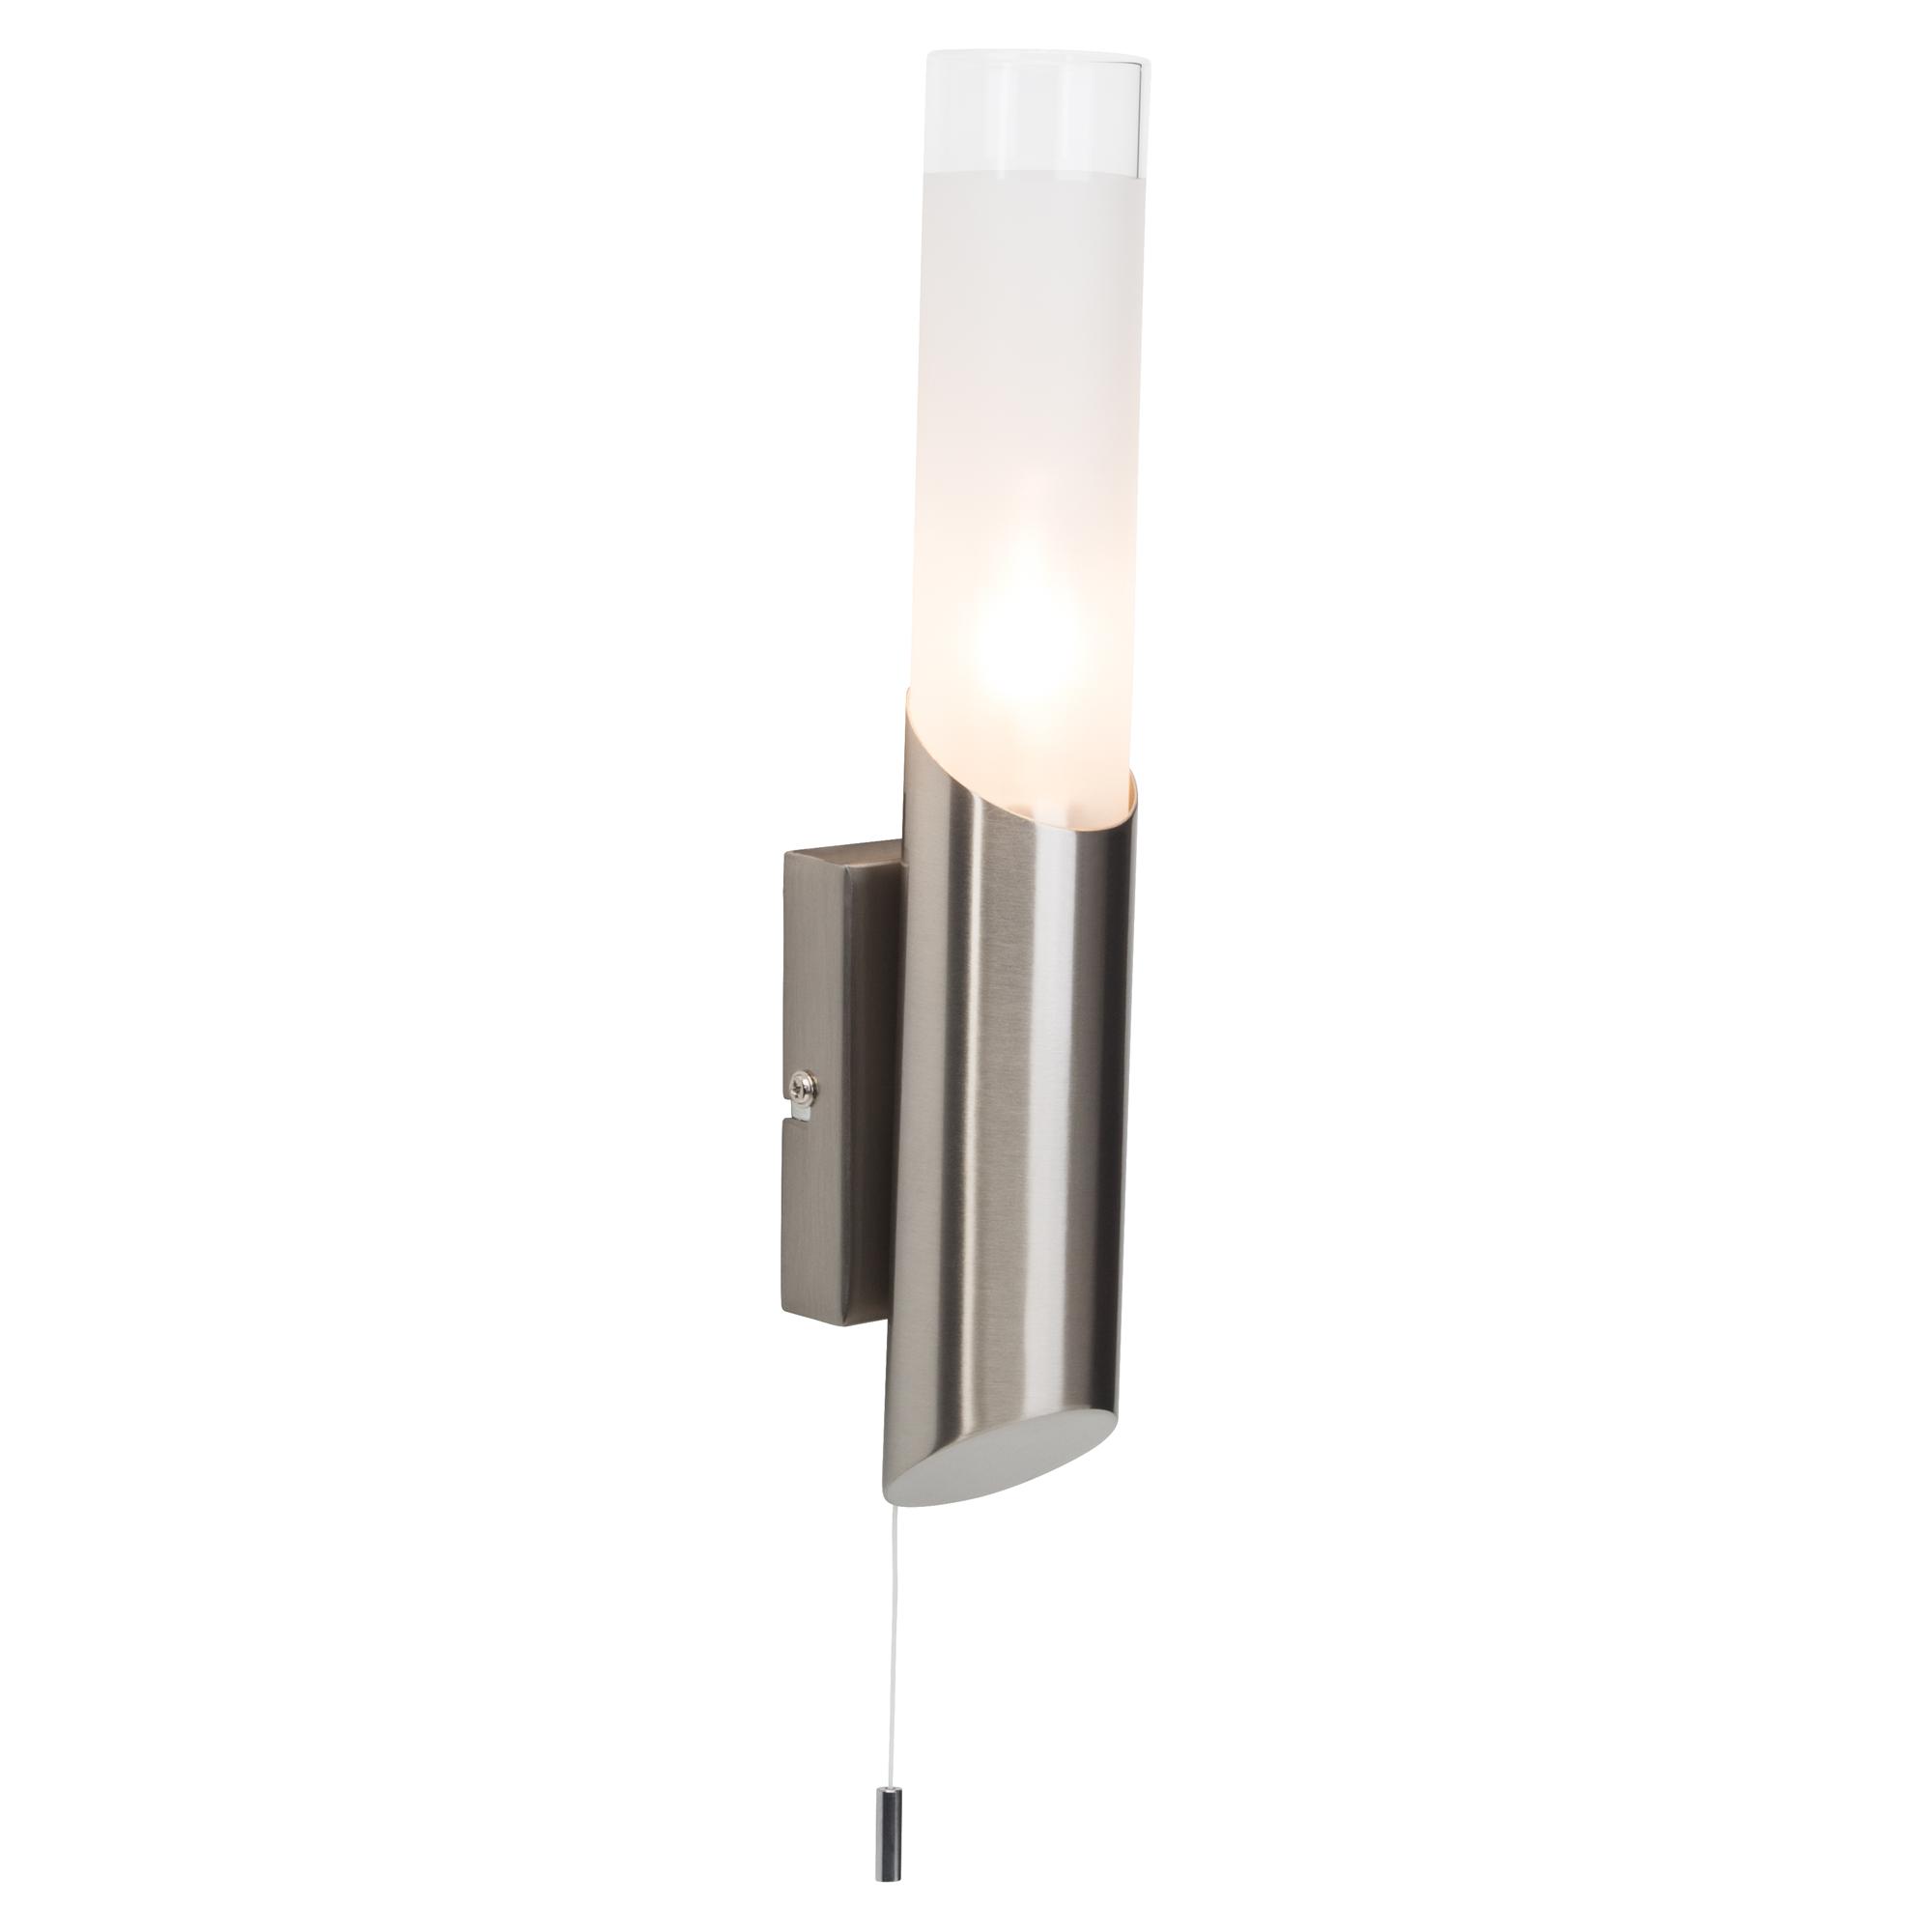 Badezimmer-Wandlampe